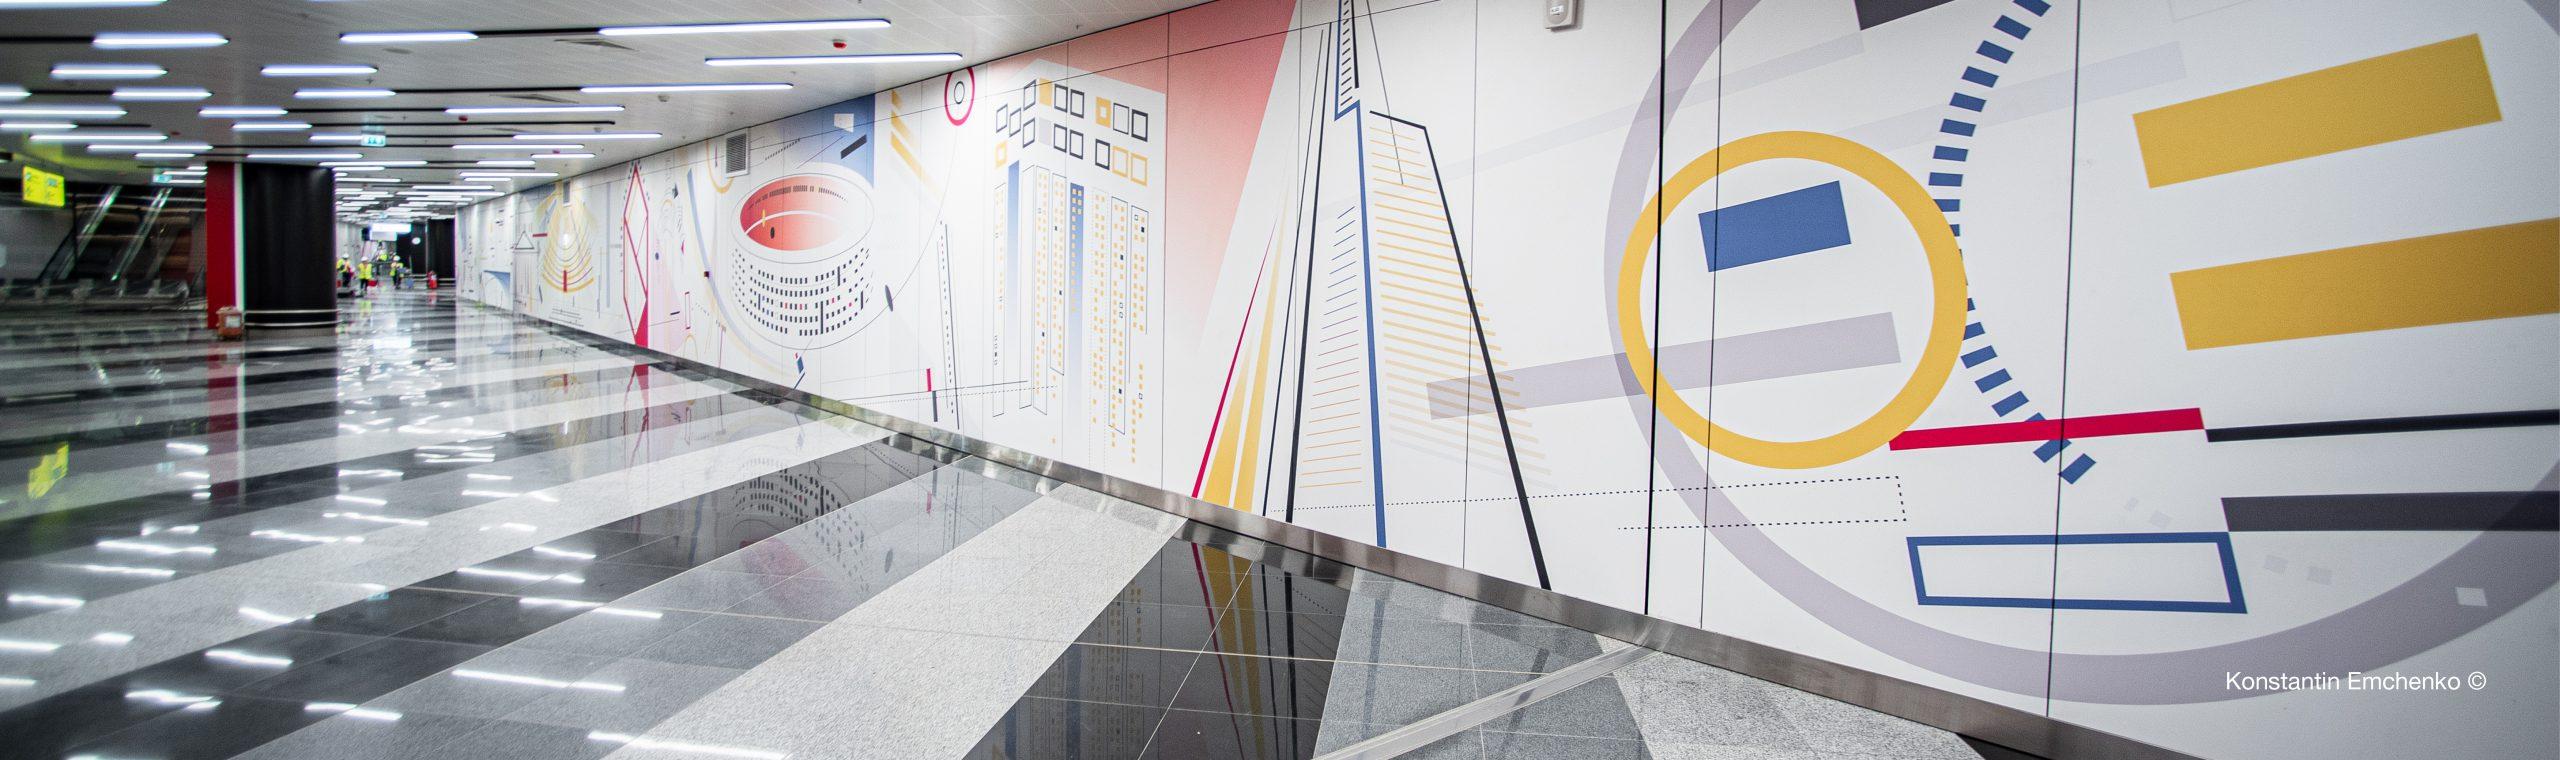 Interviewing Our RMJM Architects: Jelena Kristovic Nikolic & Goran Nikolic